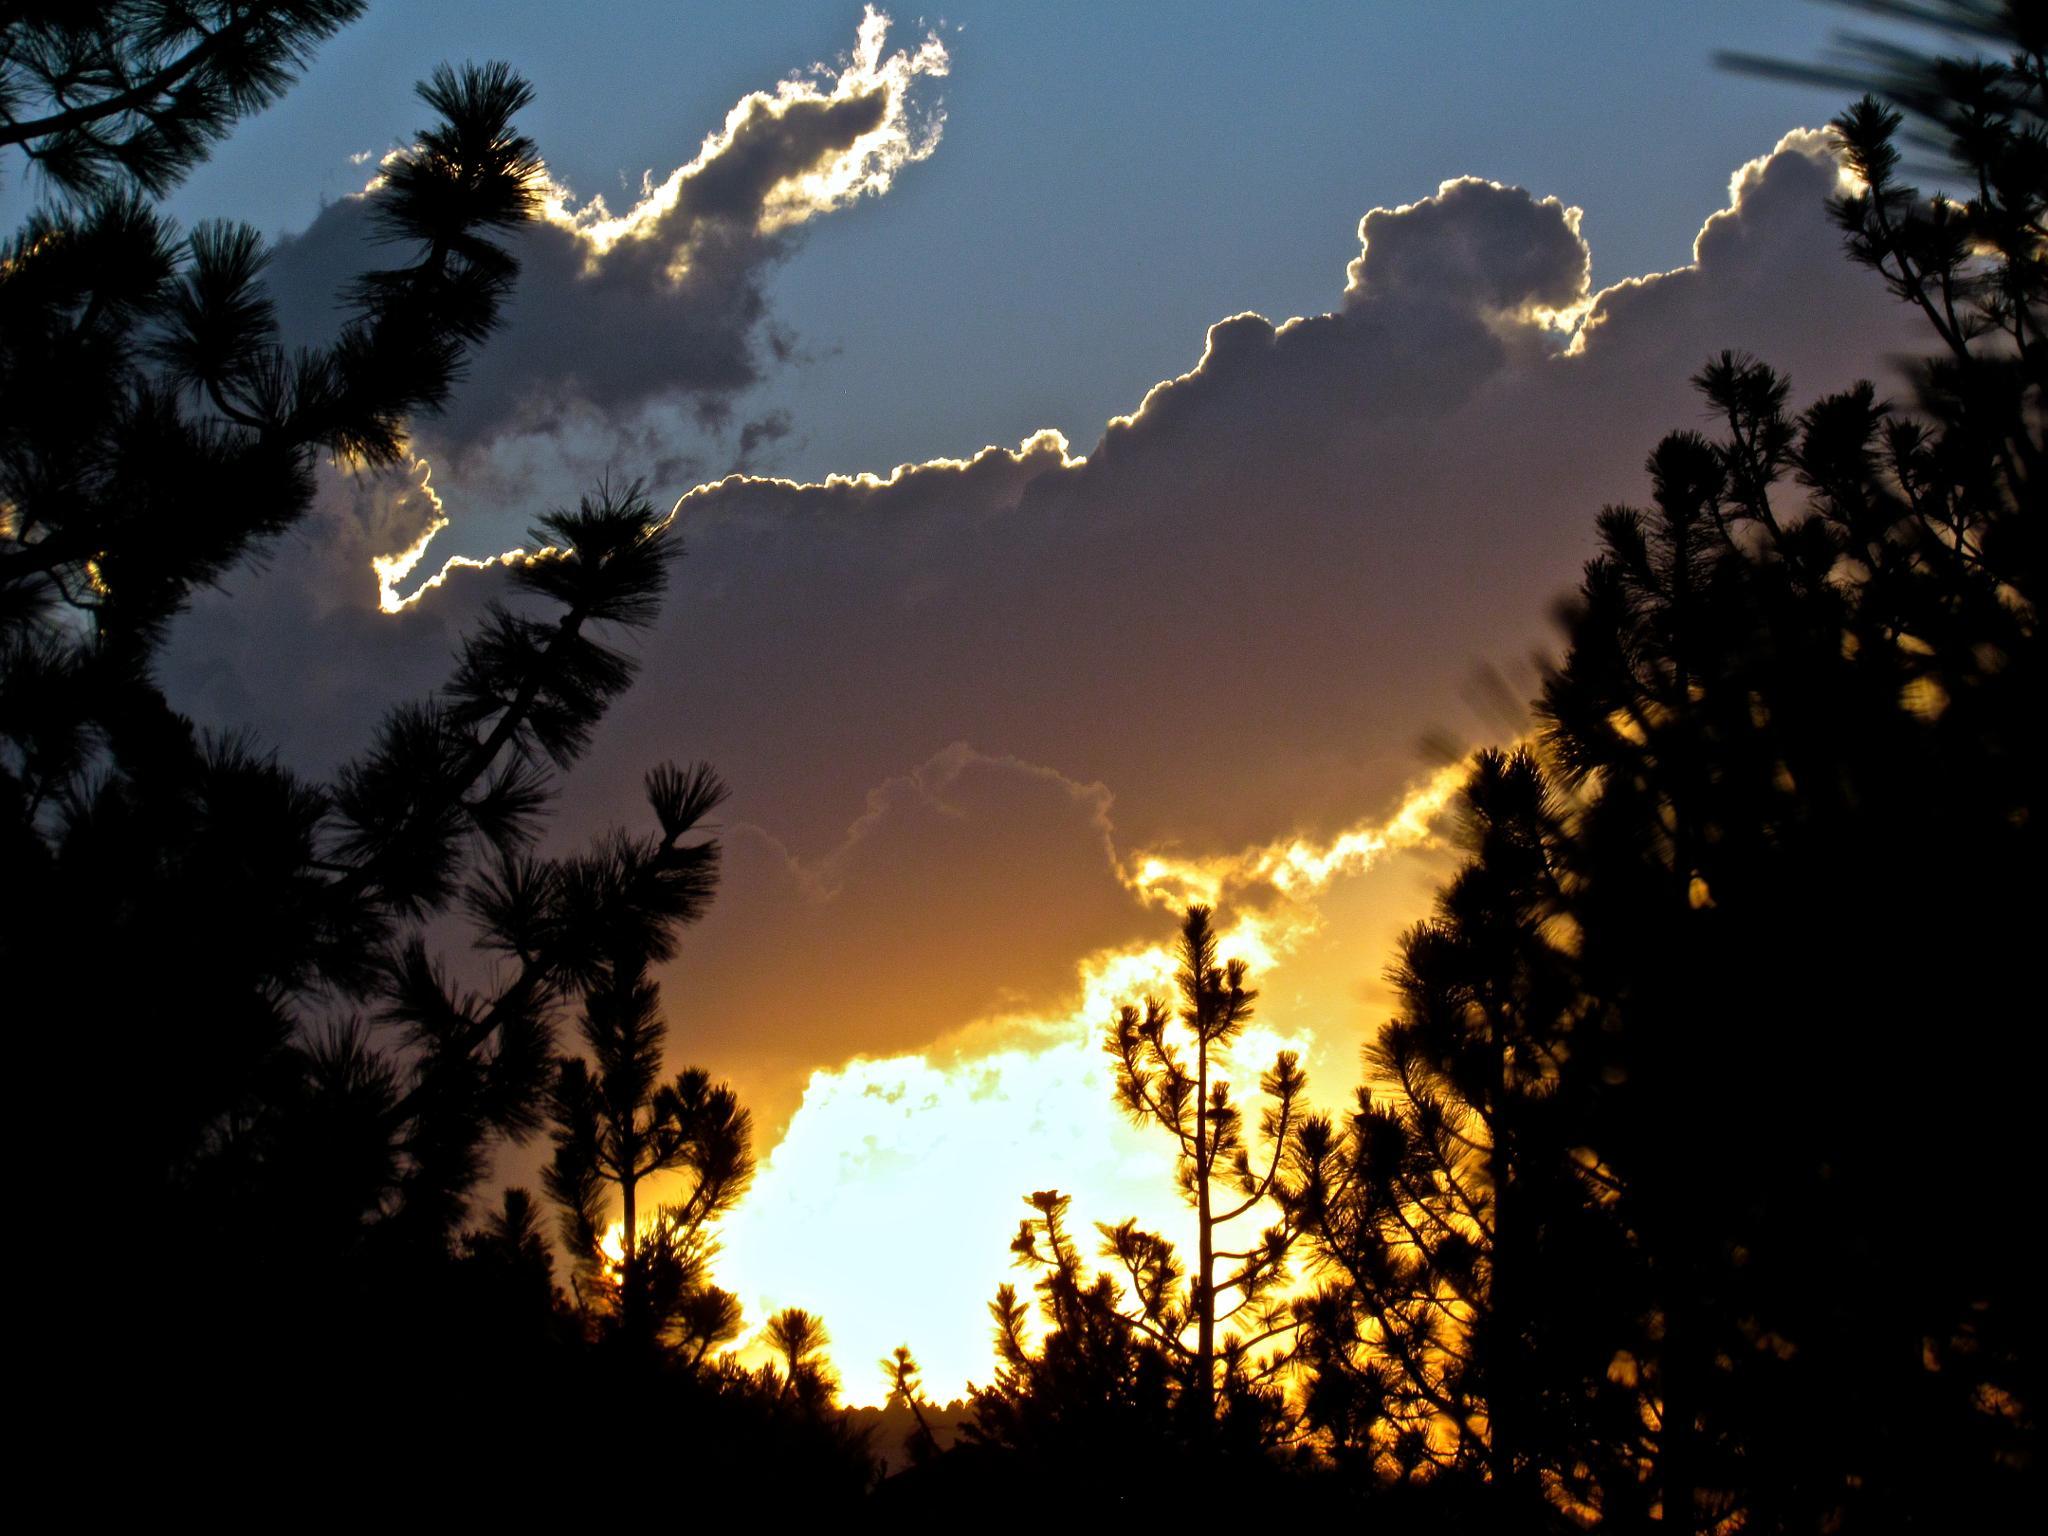 Sunset in Pine Mountain Club by MelanieAnnePhillips